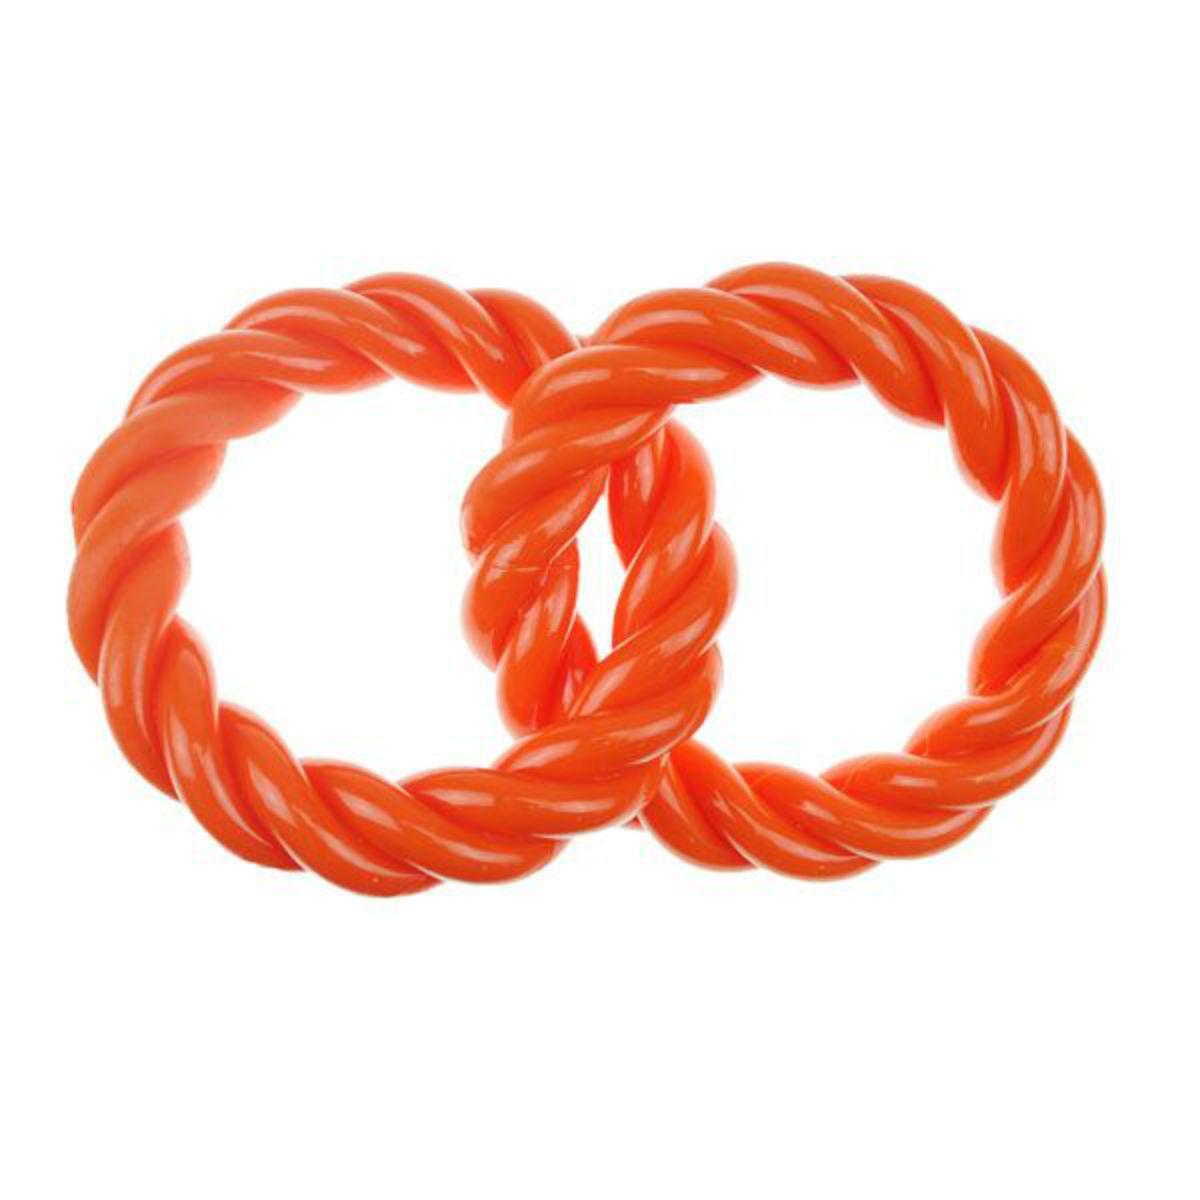 Infinity TPR 2 Rings Dog Toy - Orange